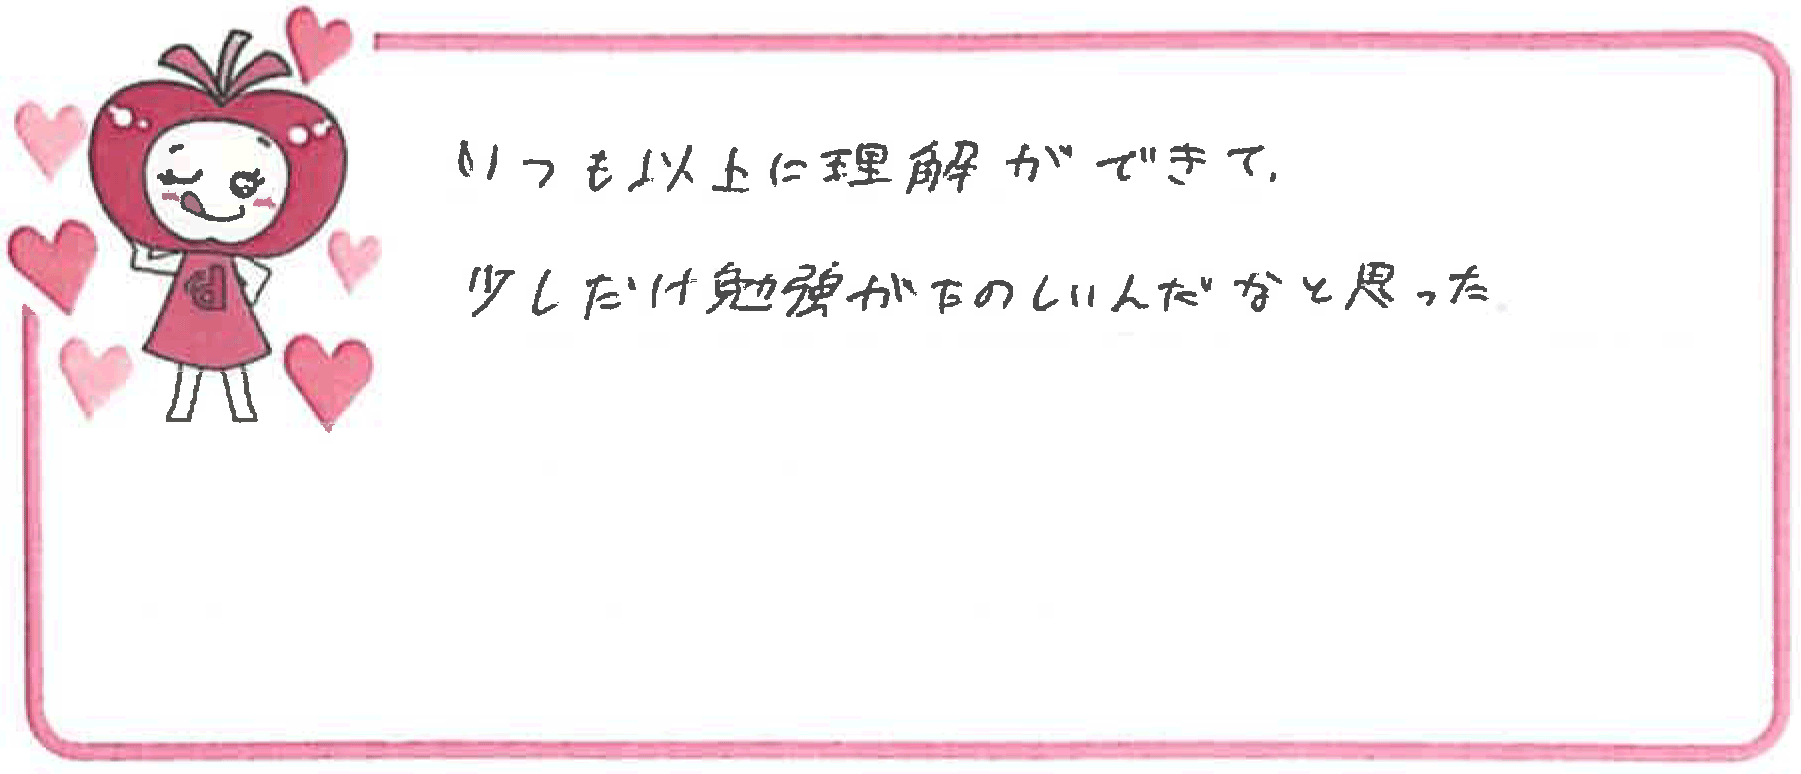 Mちゃん(近江八幡市)からの口コミ